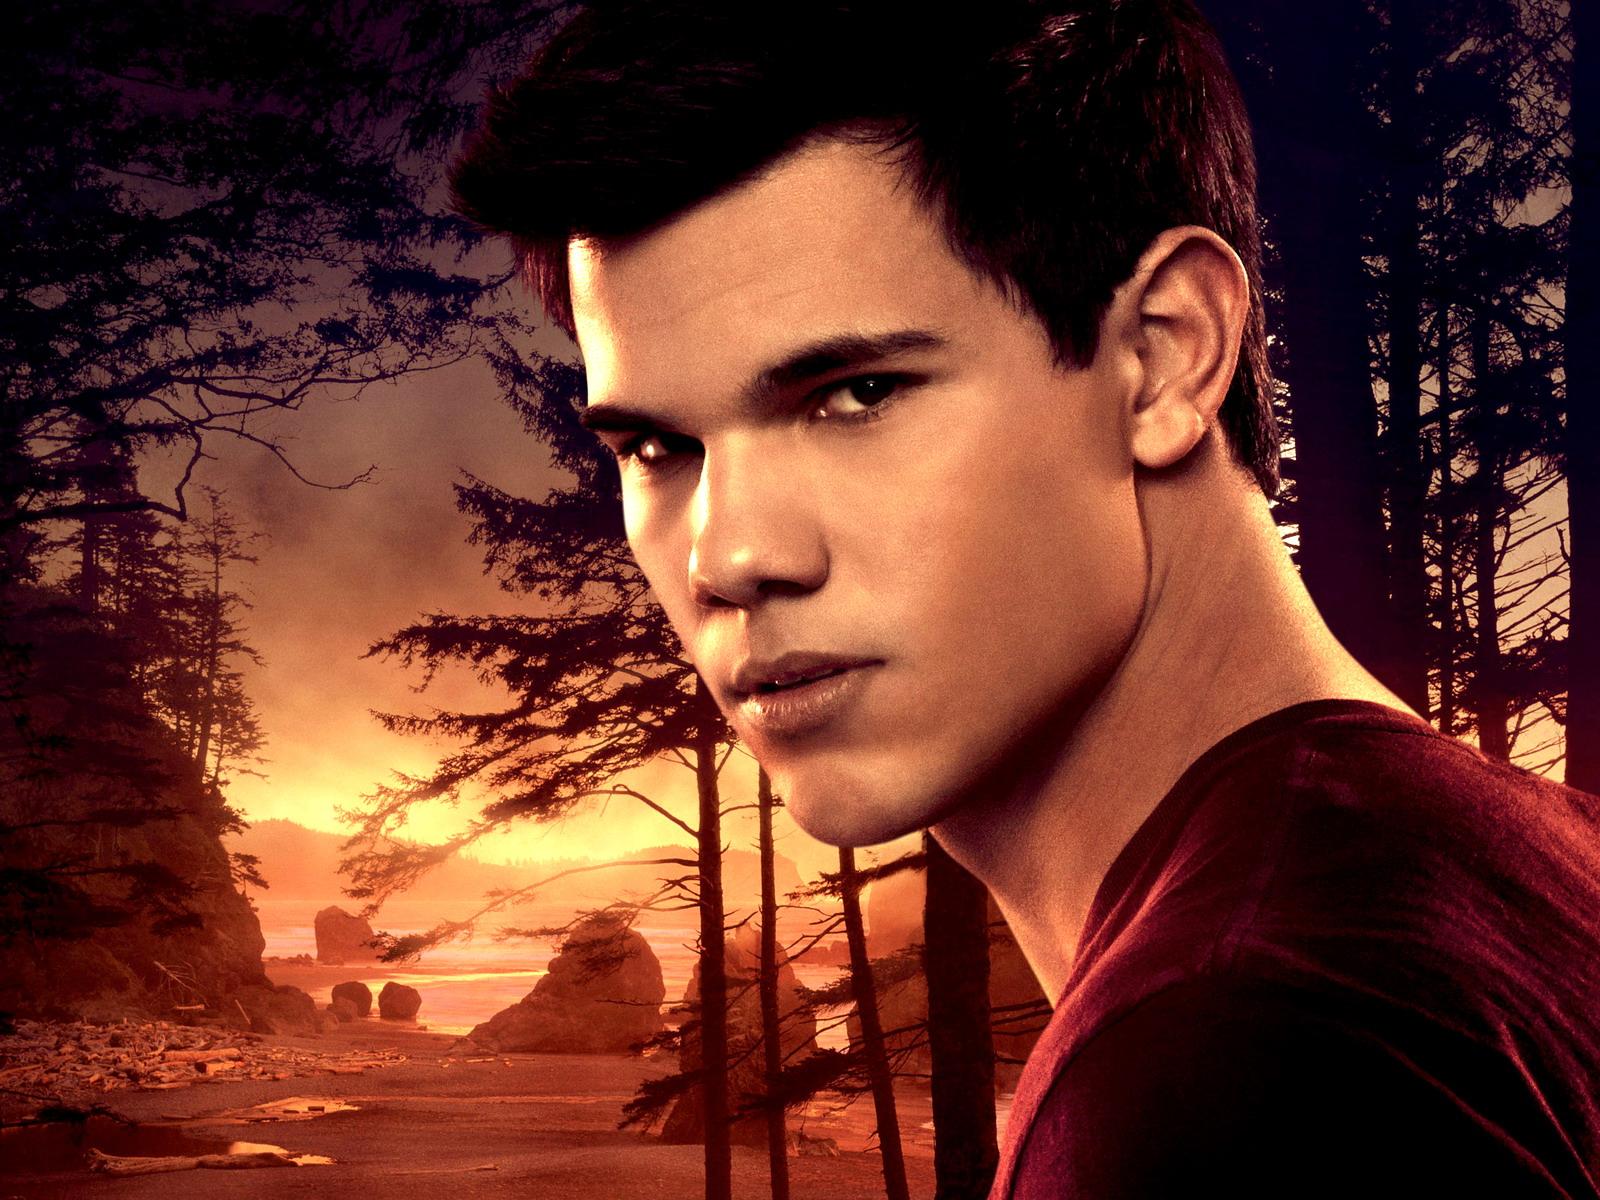 Photo The Twilight Saga Breaking Dawn The Twilight Saga Taylor Lautner Movies film